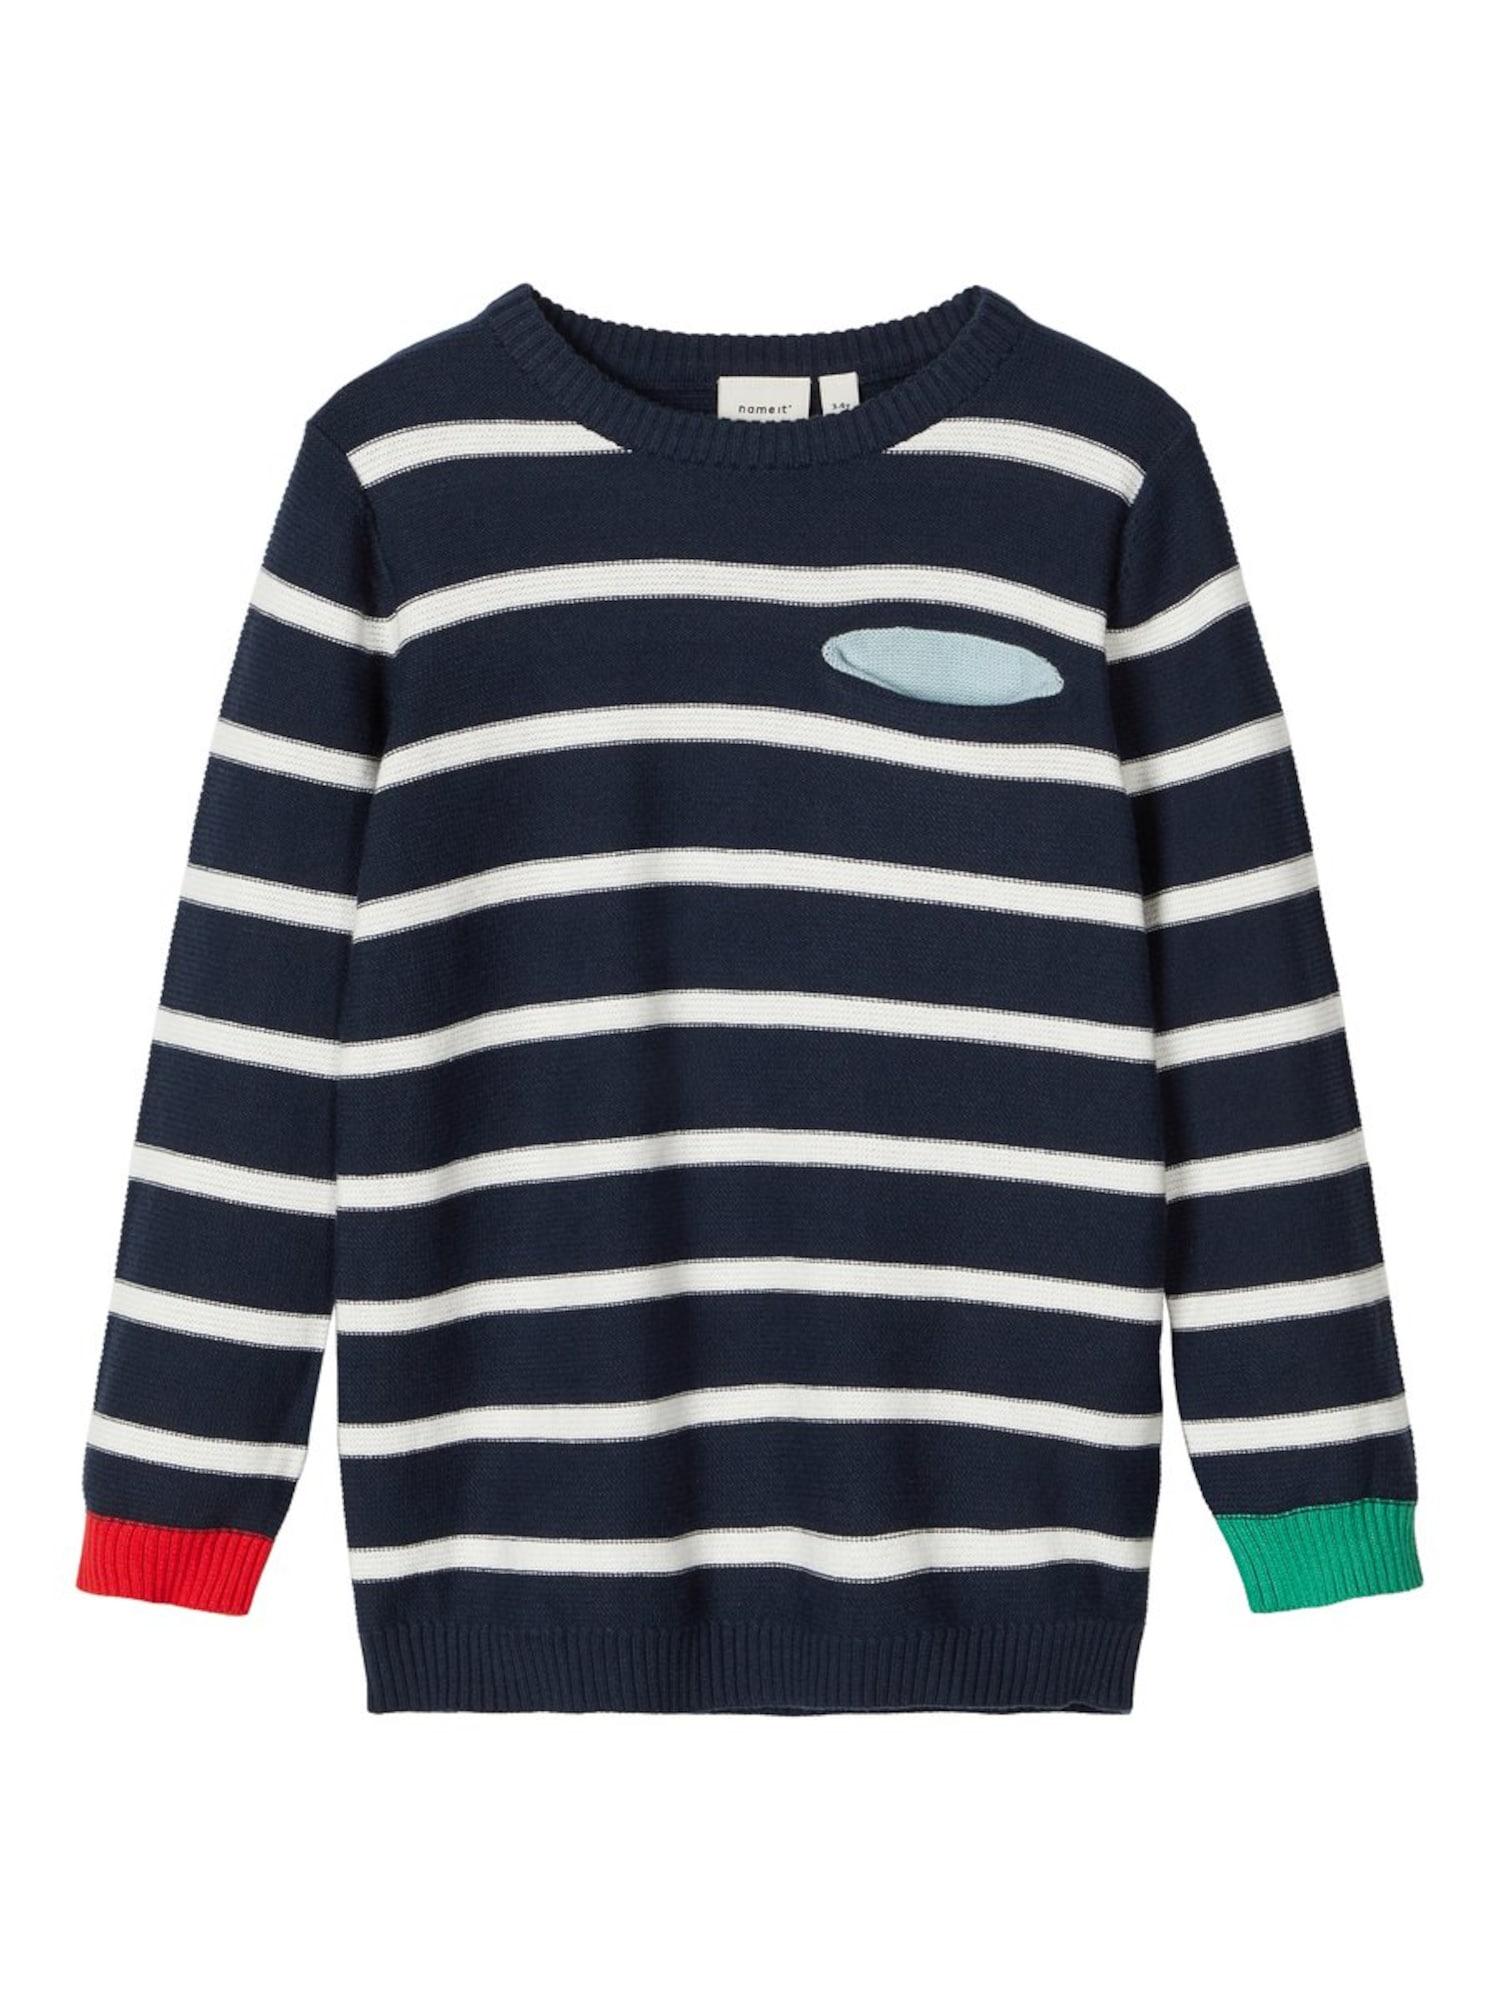 Miniboyoberteile - Pullover - Onlineshop ABOUT YOU